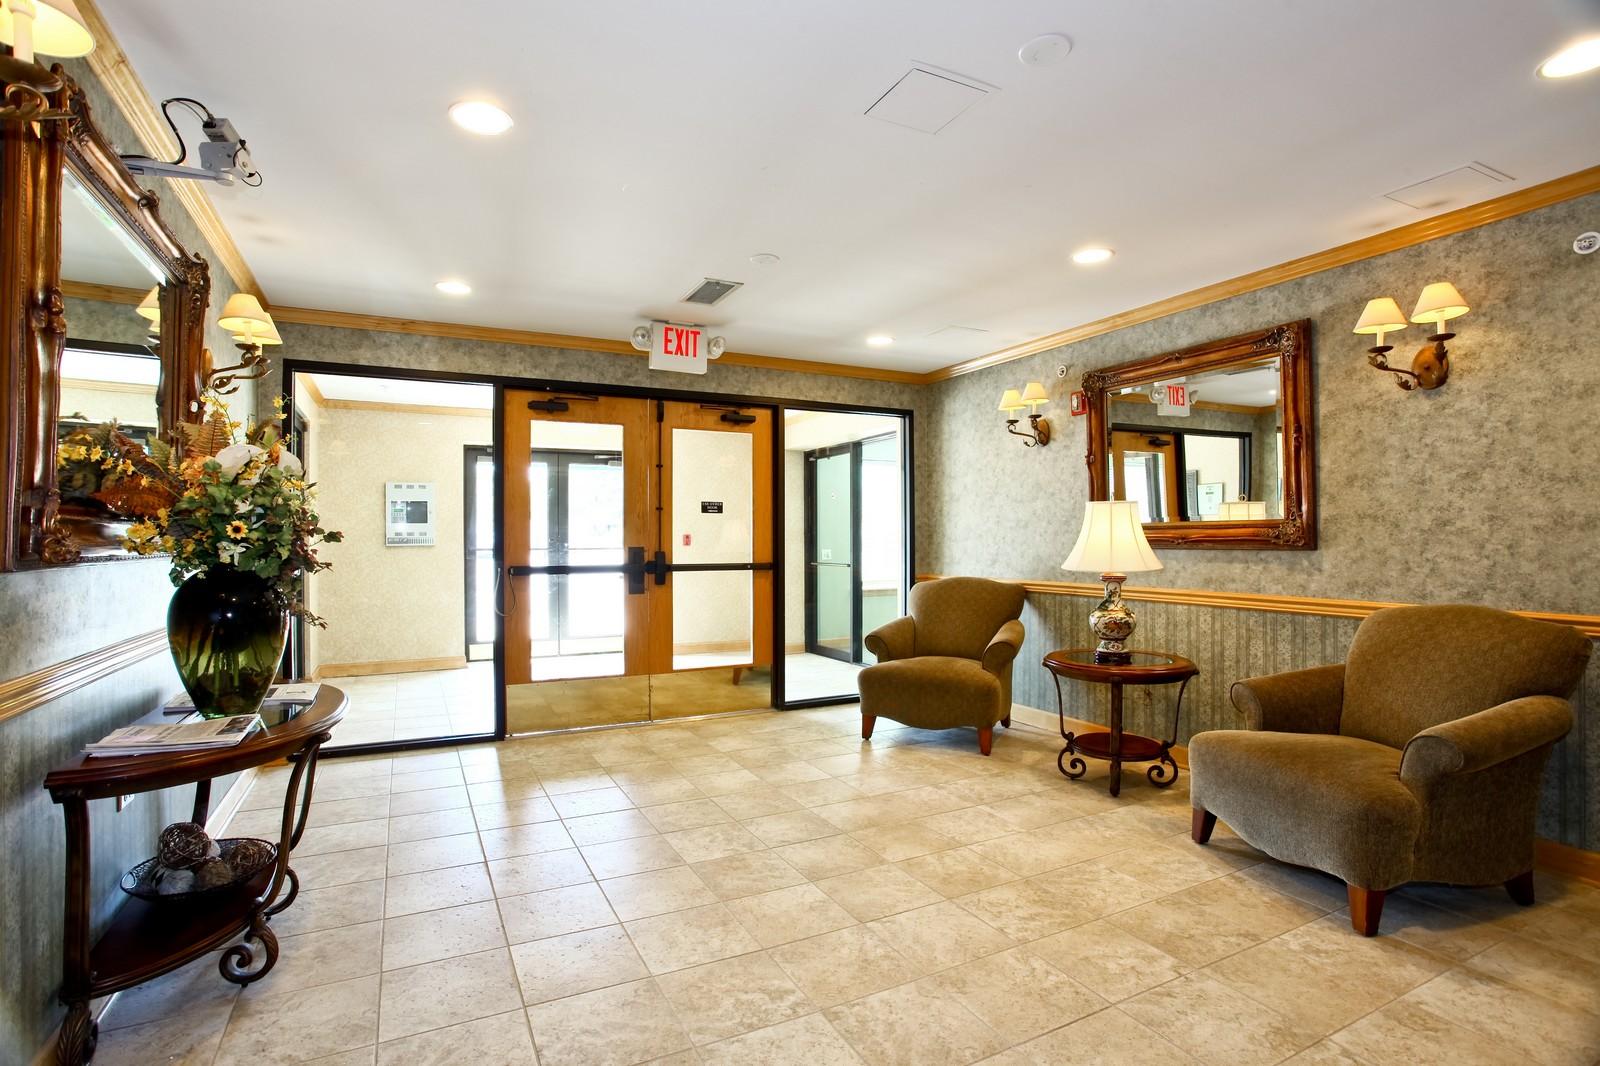 Real Estate Photography - 570 Crescent Blvd., 301, Glen Ellyn, IL, 60137 - Location 1